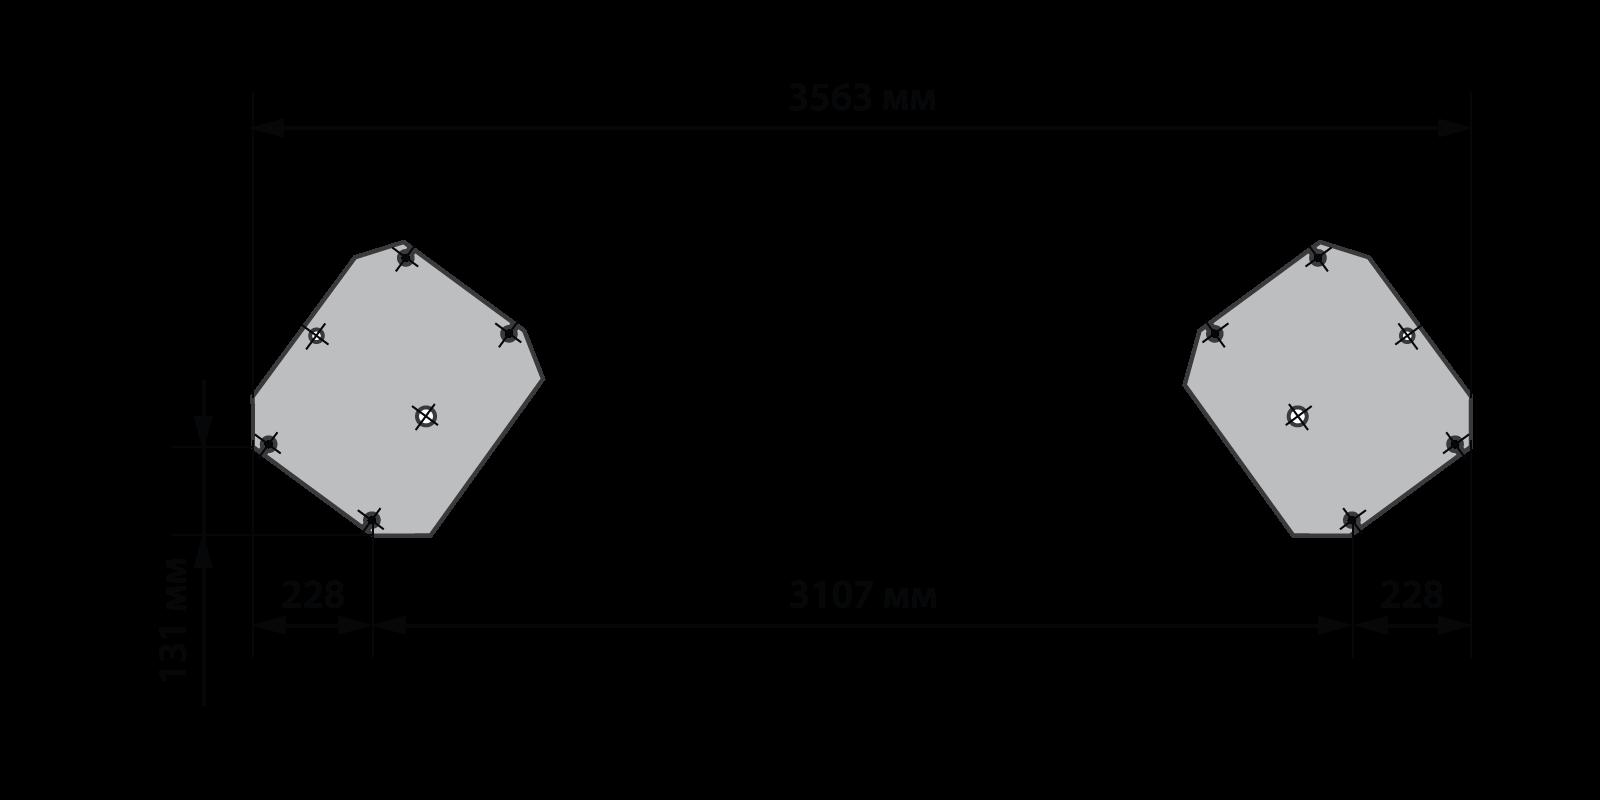 TLT245AT_Asymmetry-01.jpg